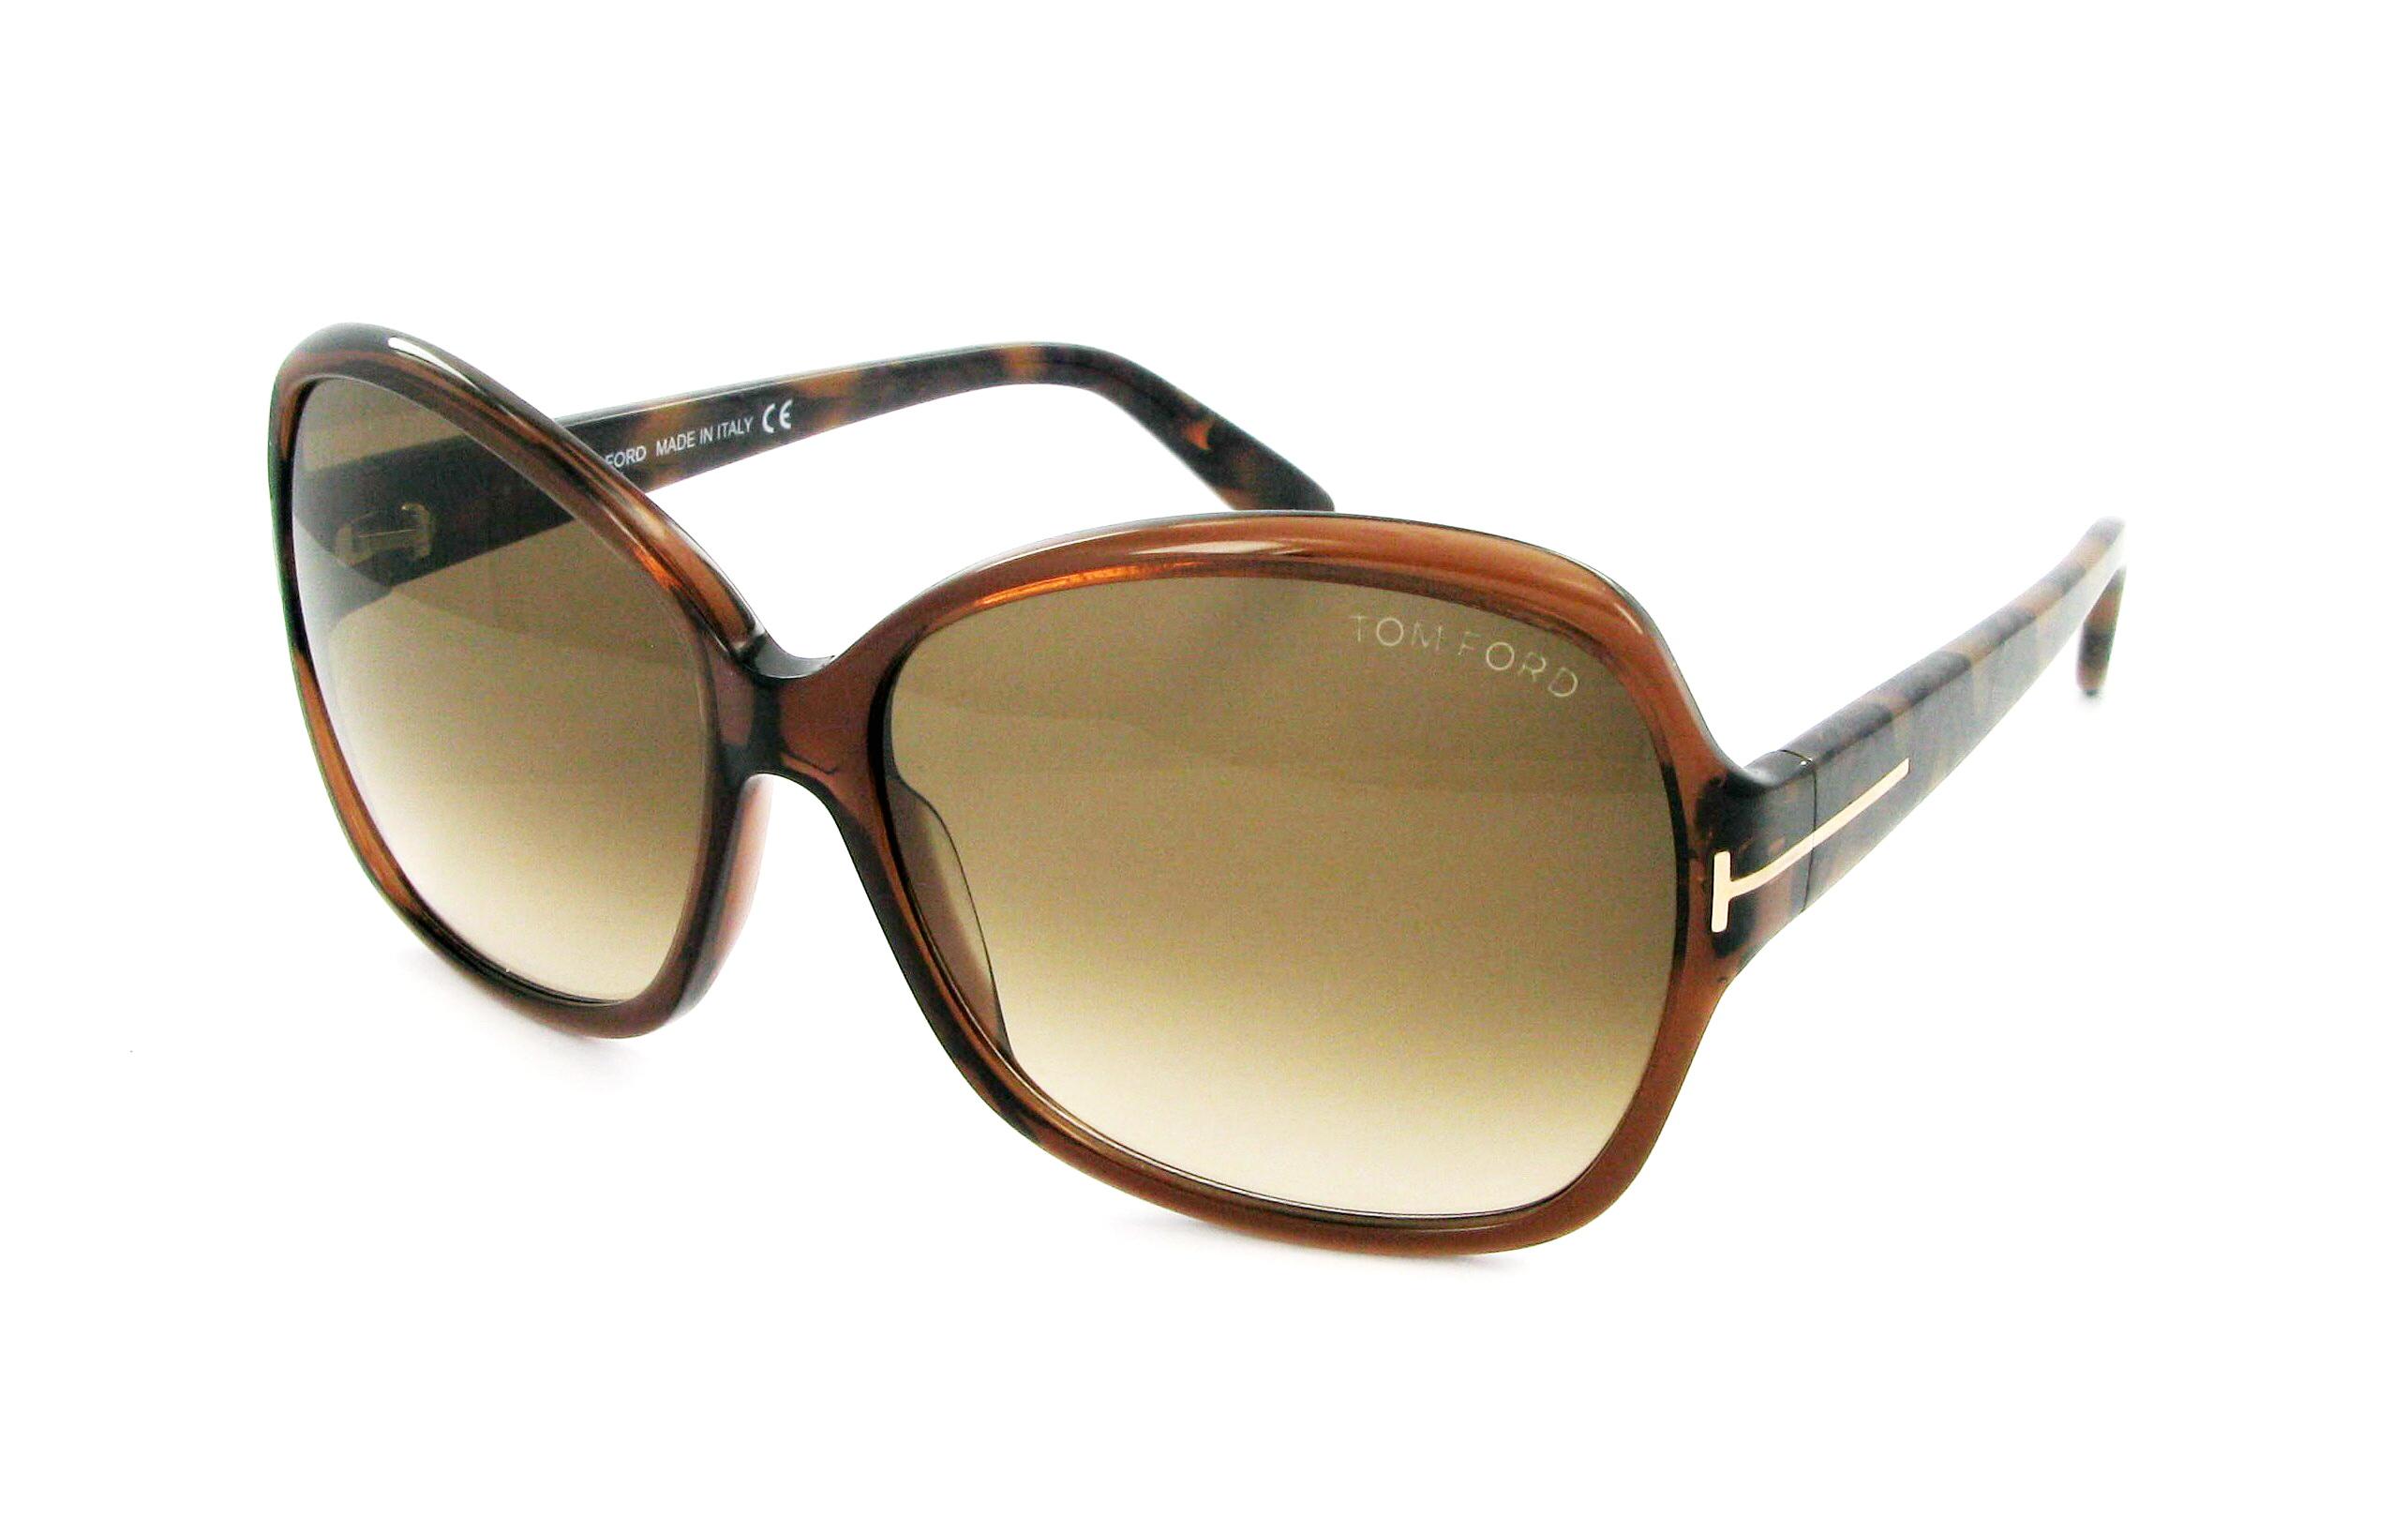 lunettes de soleil tom ford ft 0229 48f 60 14 femme marron carr e cercl e fashion 60mmx14mm 253. Black Bedroom Furniture Sets. Home Design Ideas